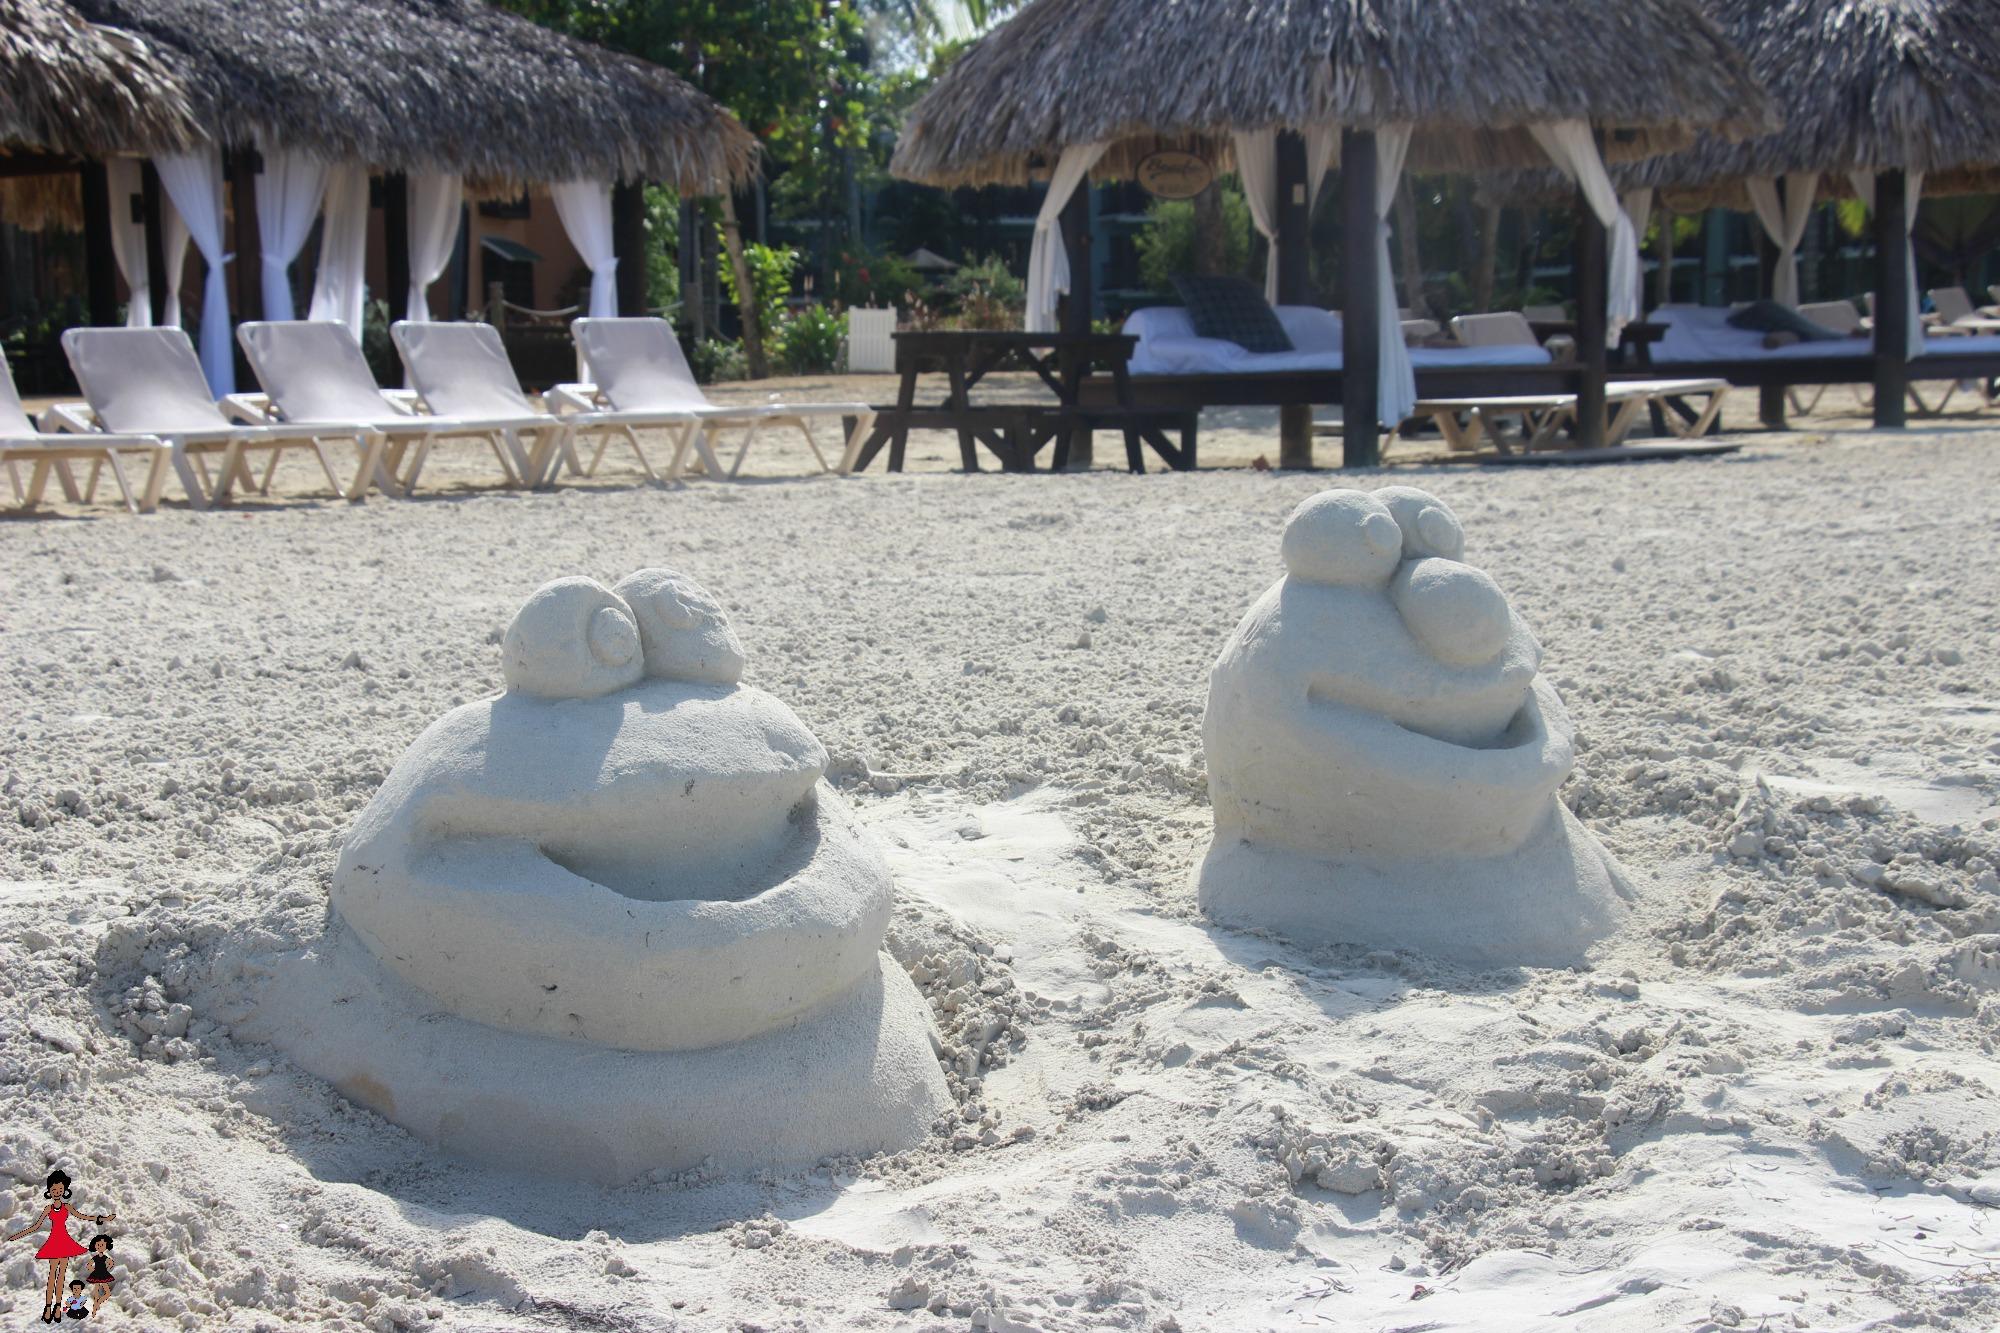 beaches-negril-tripbeaches-negril-trip